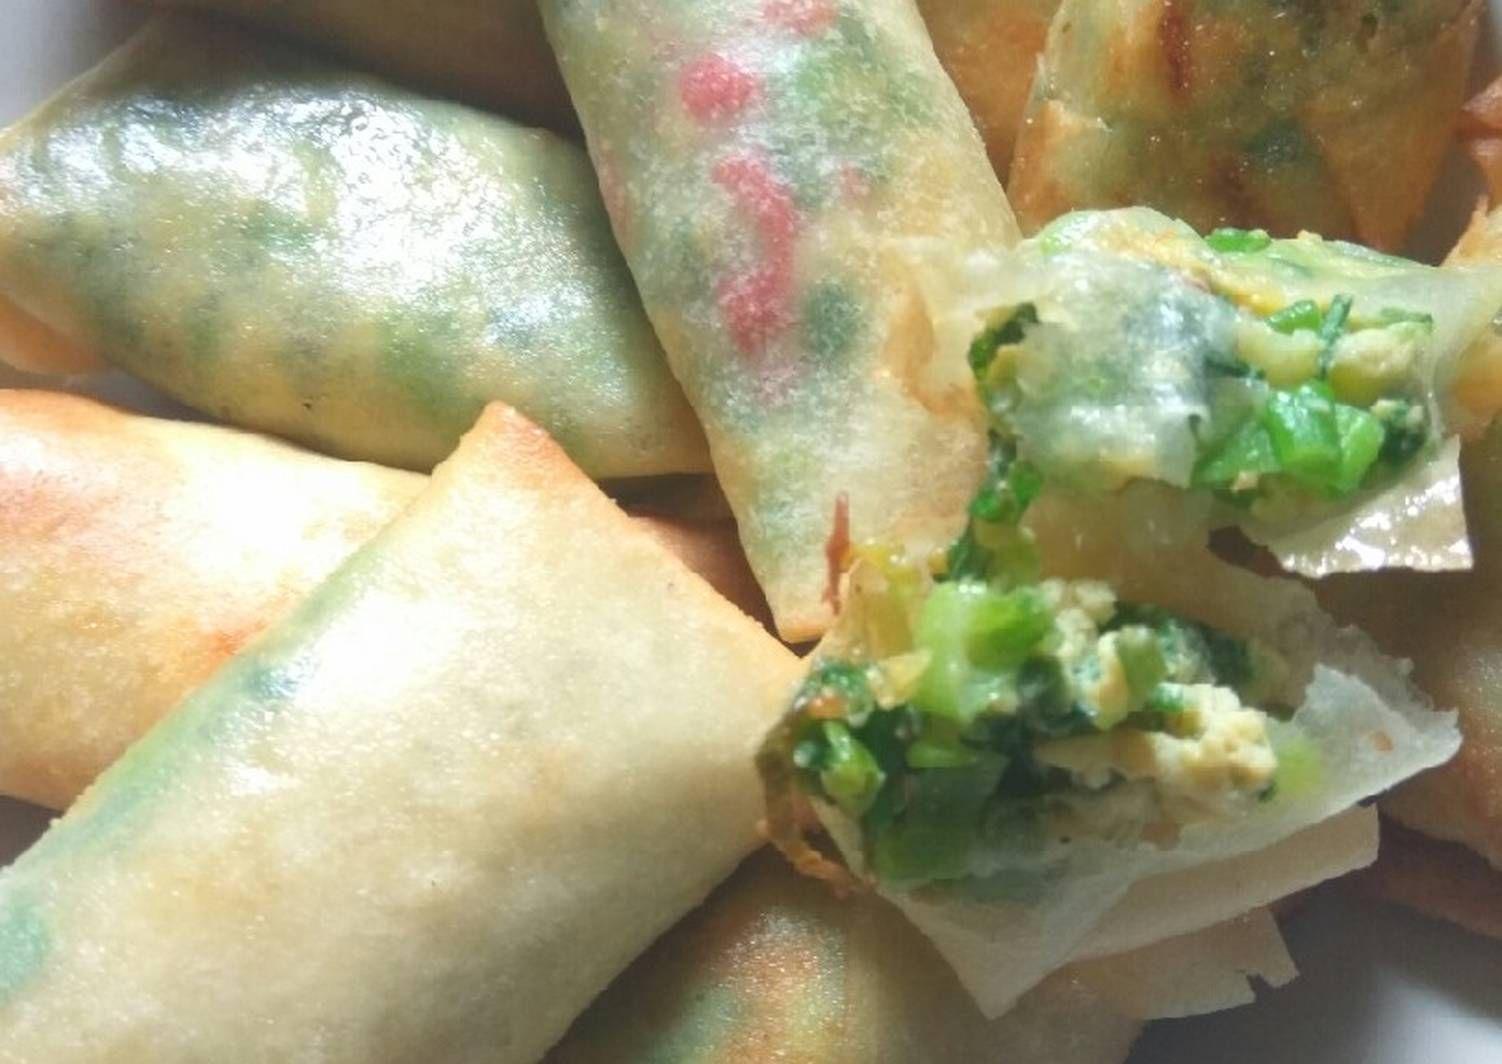 Resep Martabak Telur Kulit Lumpia Oleh Siti Nurhaliza Resep Resep Makanan Dan Minuman Ide Makanan